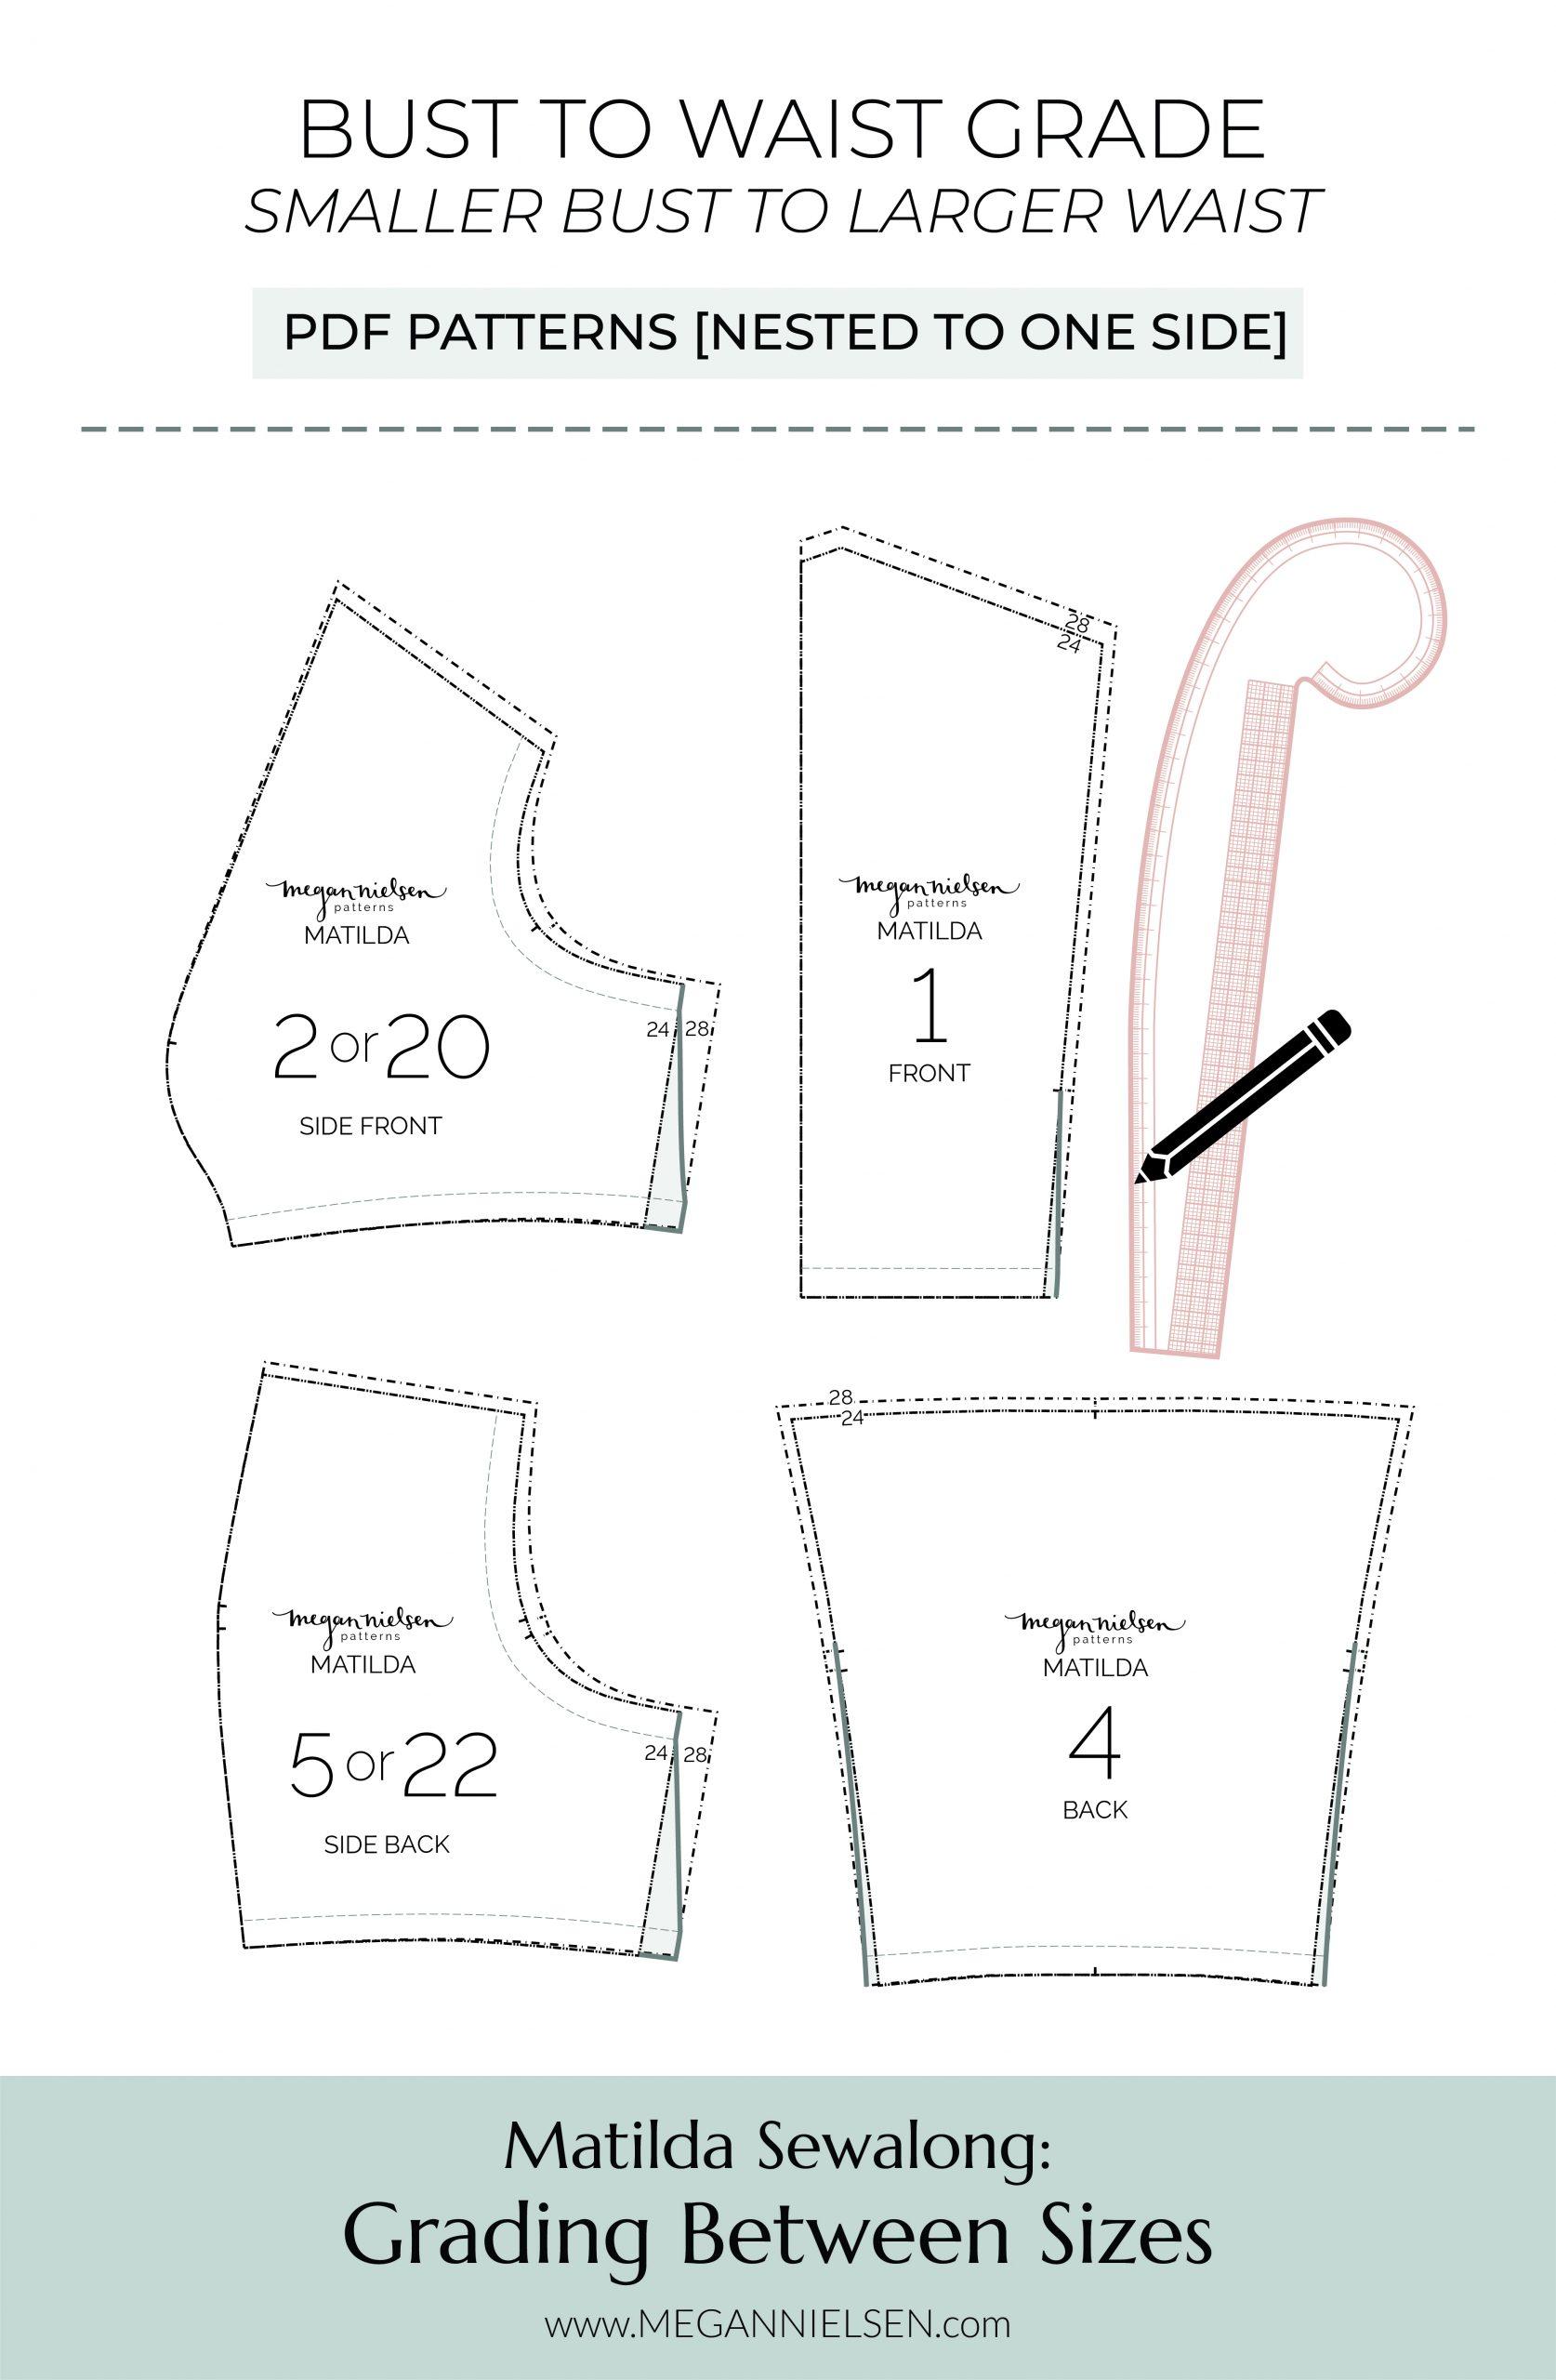 Megan Nielsen Patterns   Matilda Sewalong: Grading Between Sizes - Smaller Bust To Larger Waist Grade - PDF Patterns